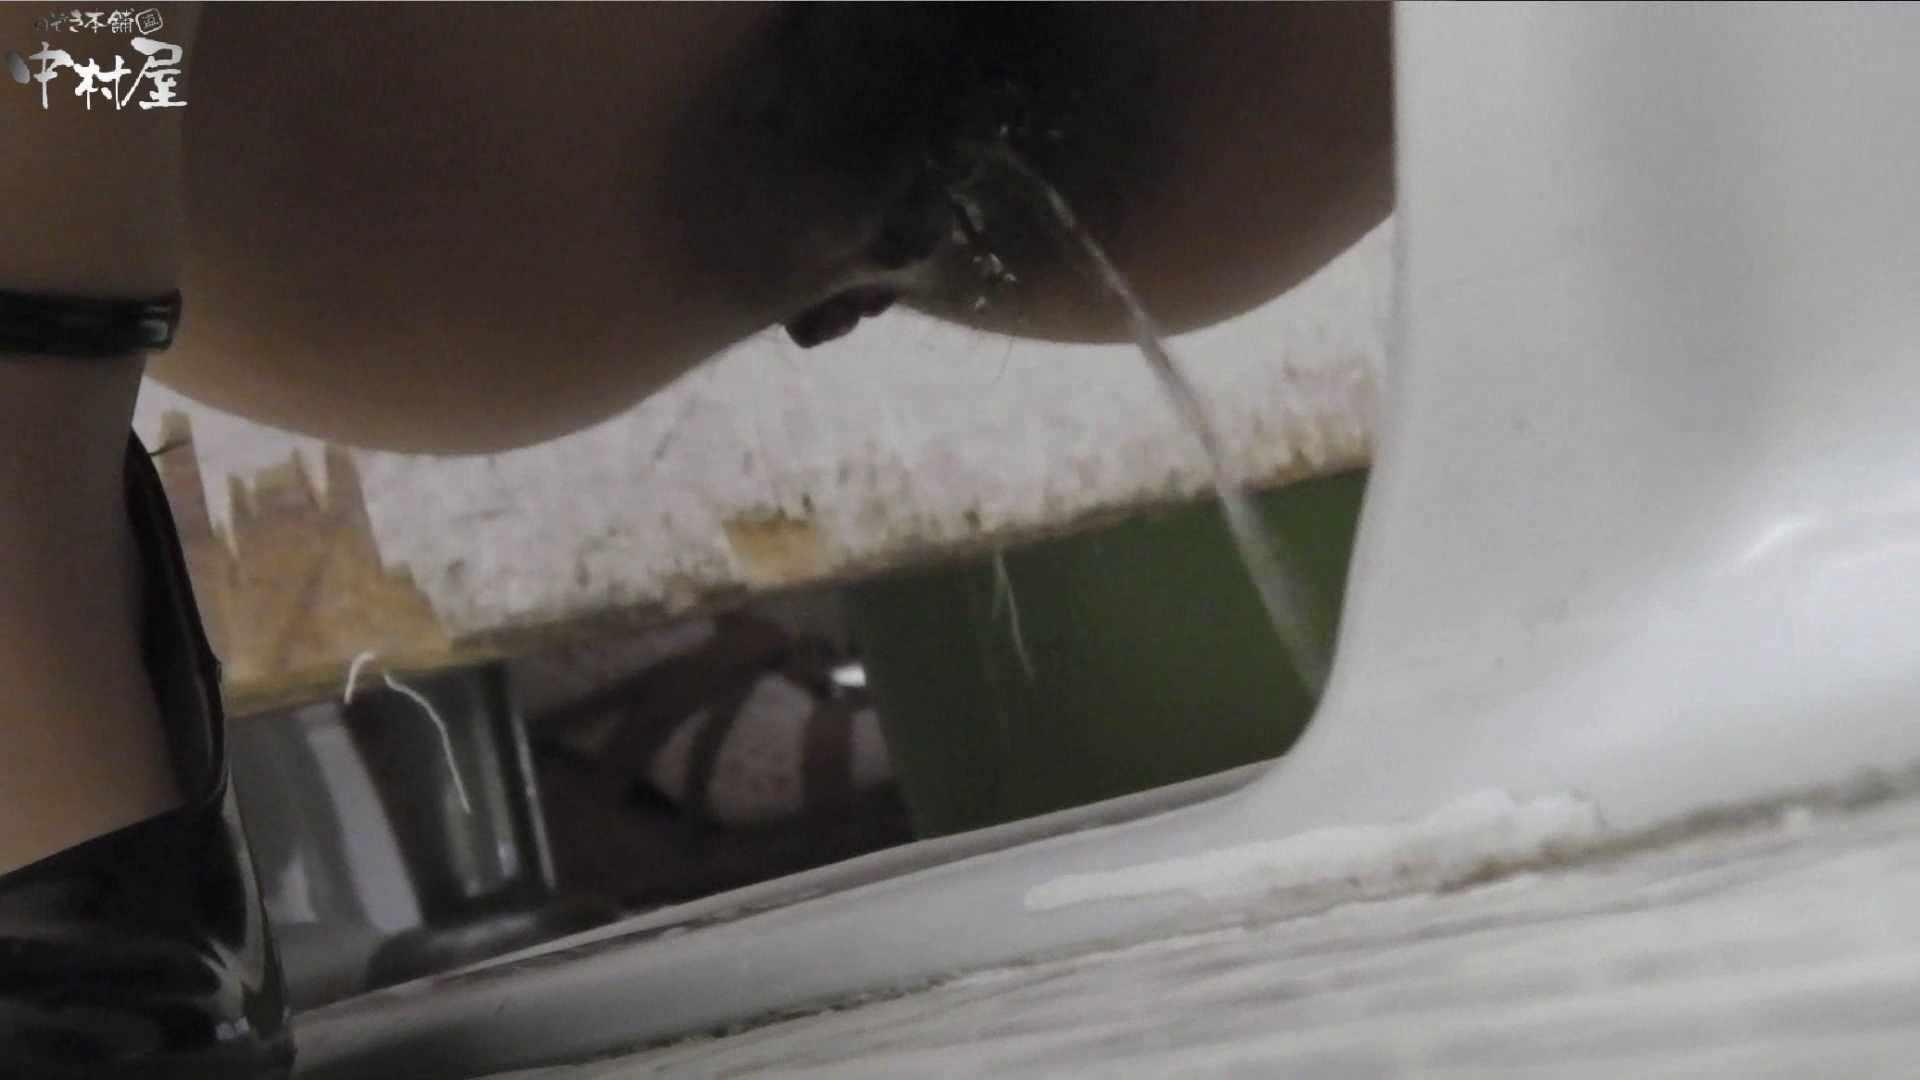 vol.08 命がけ潜伏洗面所! わかめ酒タラタラ 潜入 盗み撮り動画キャプチャ 103画像 6